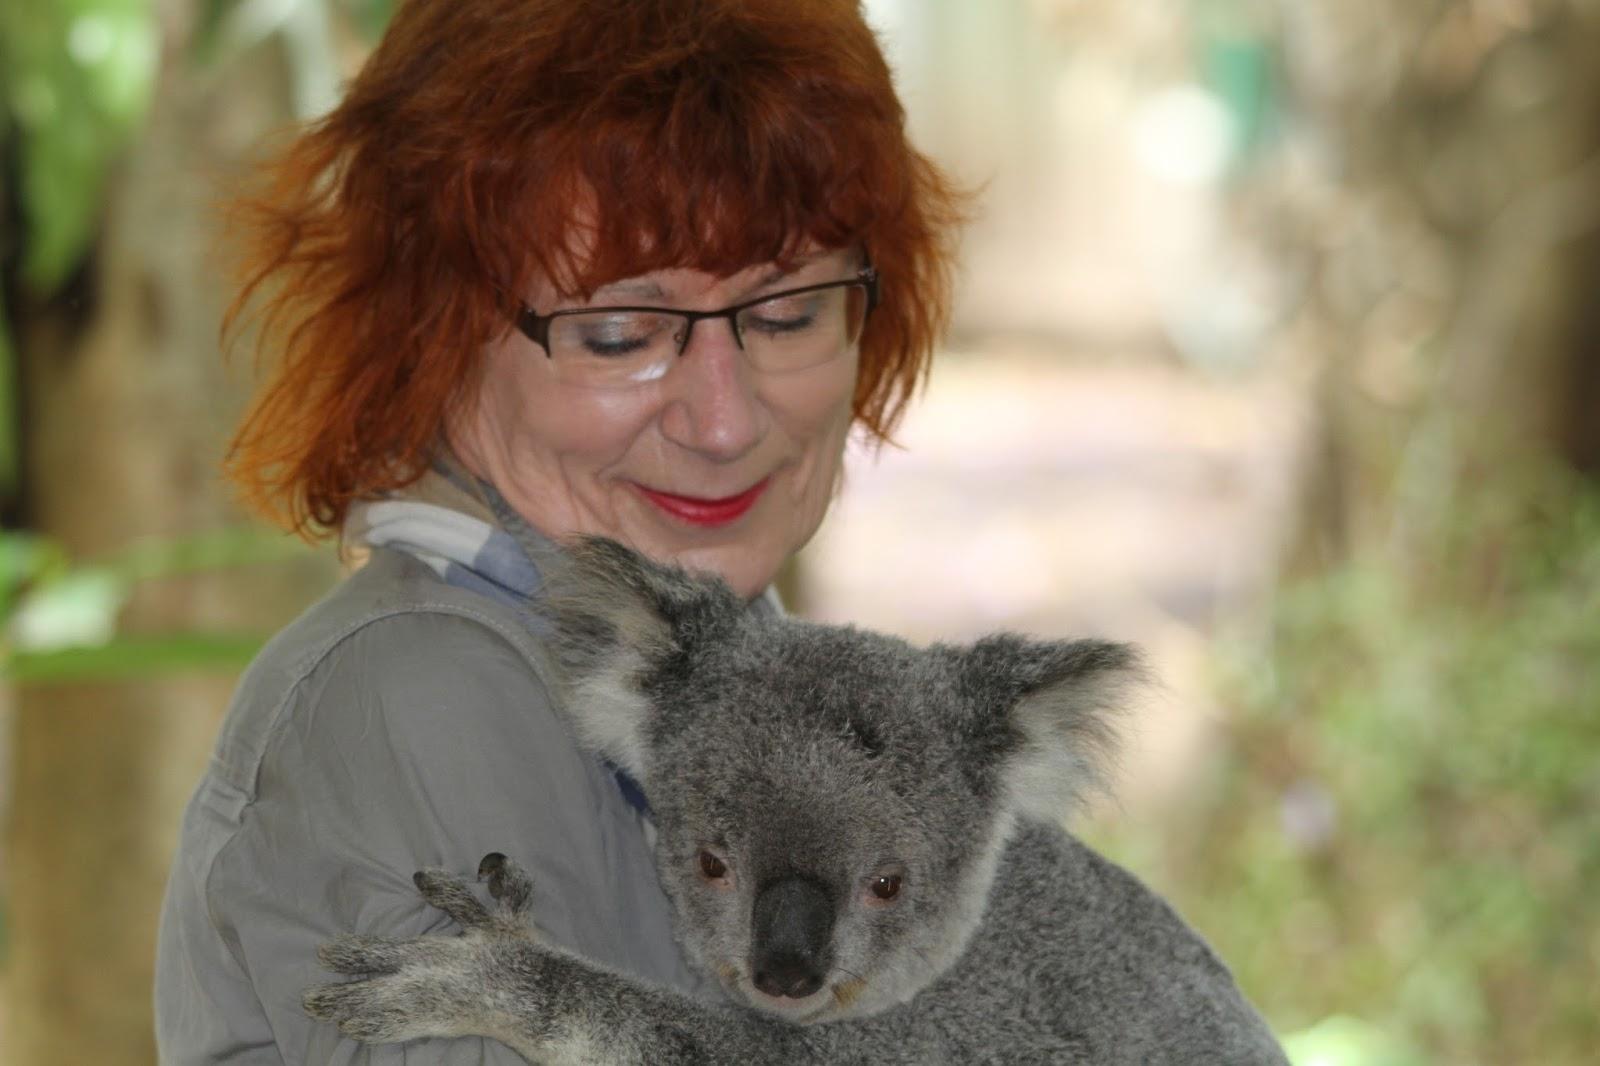 A woman holding a koala.